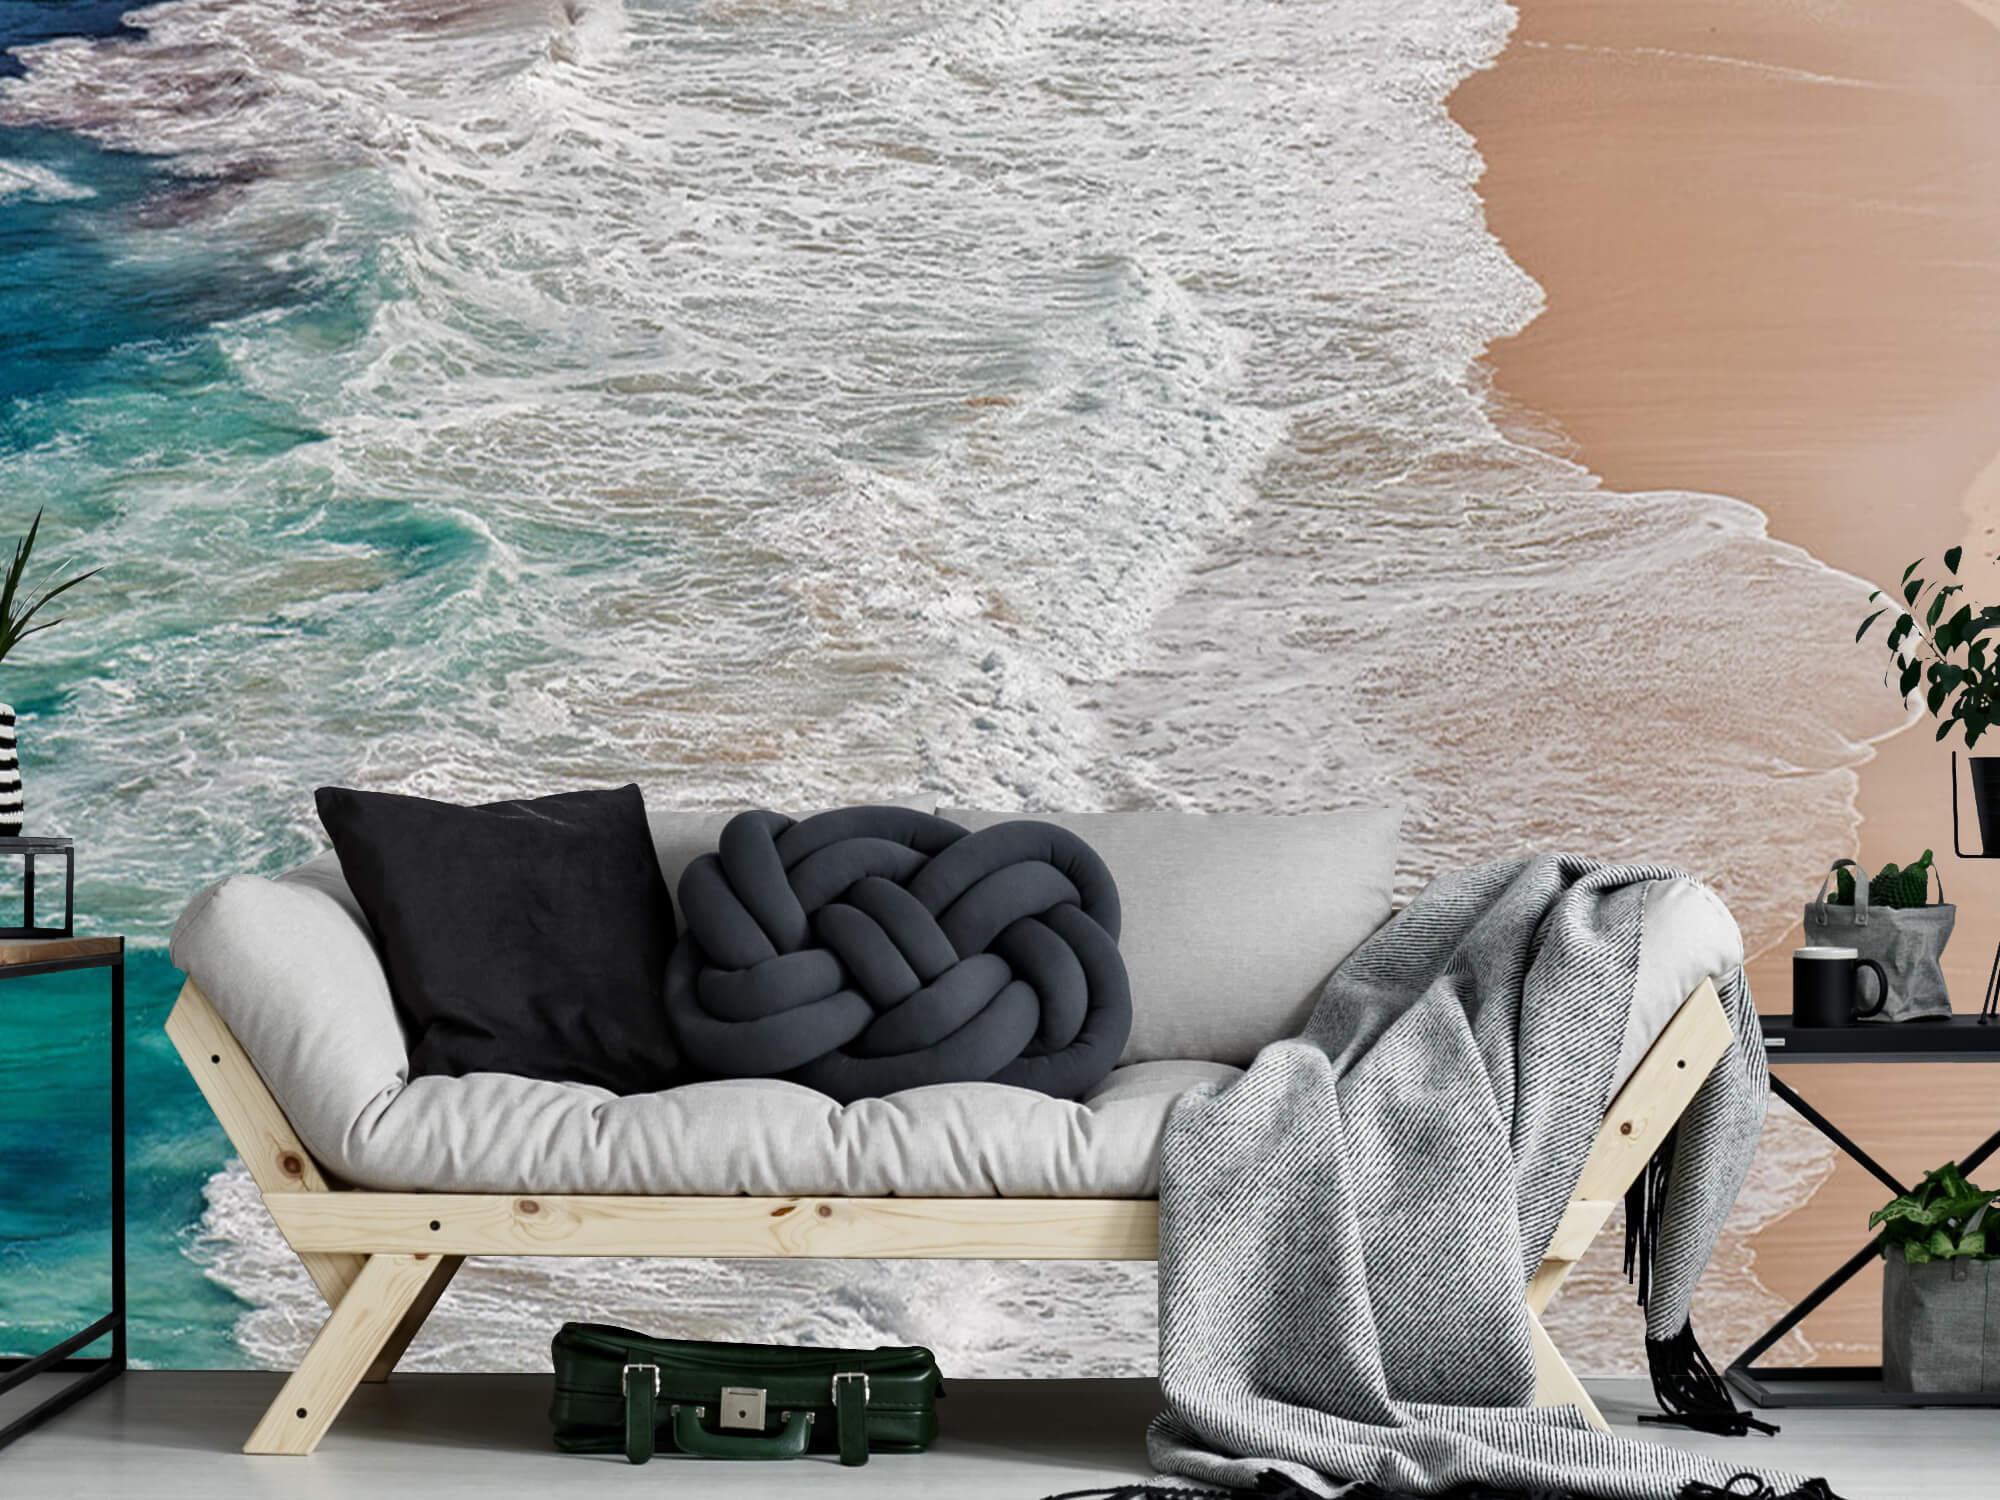 Where the Ocean Ends... 4